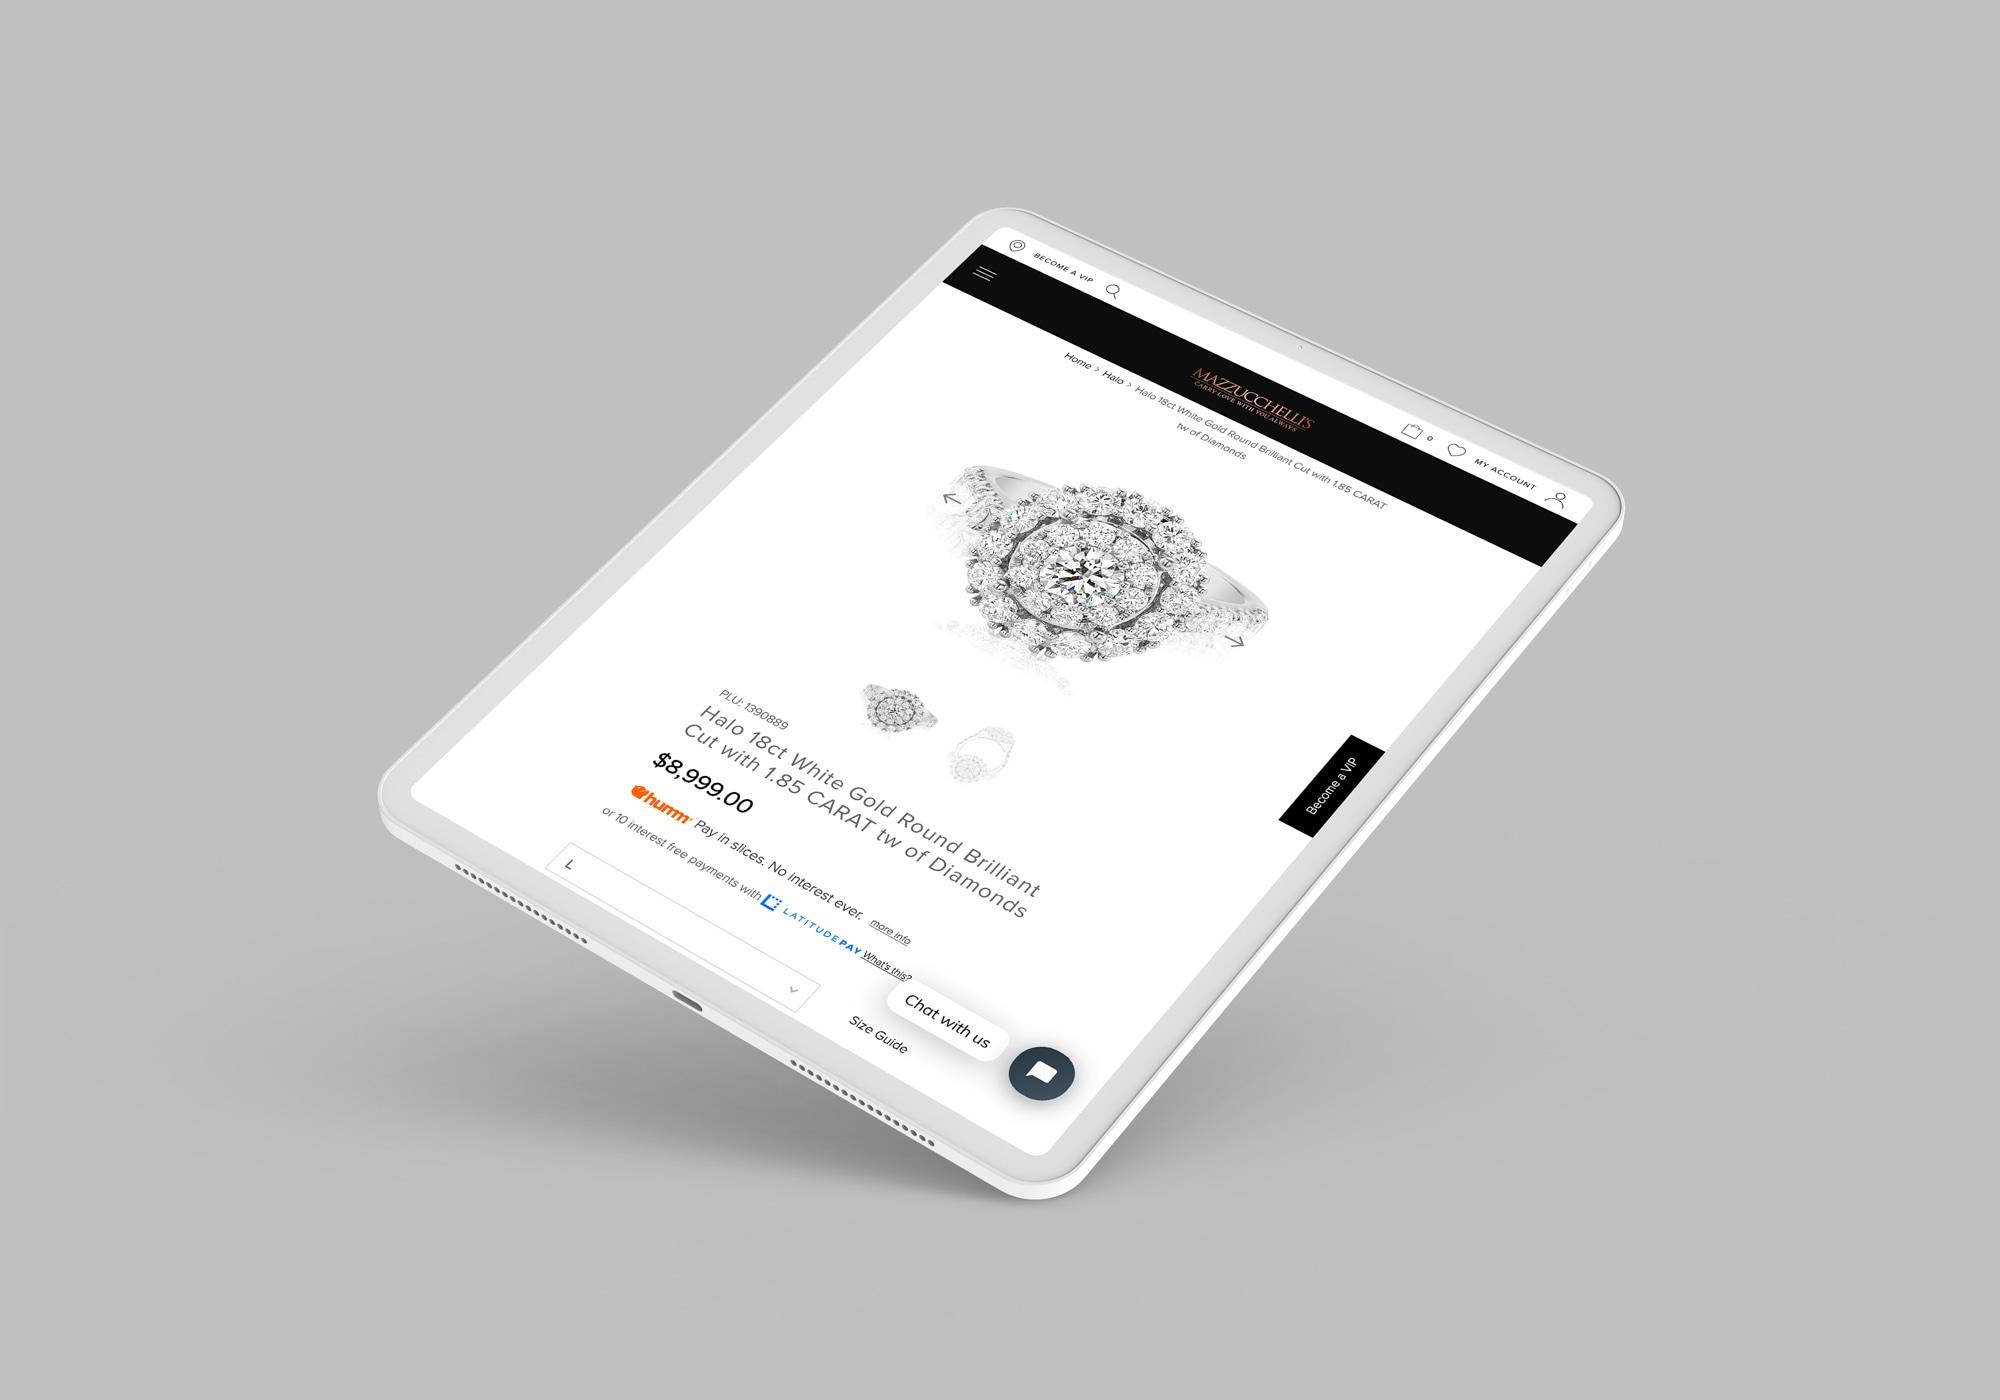 Mazzucchelli's Website eCommerce Creative on iPad